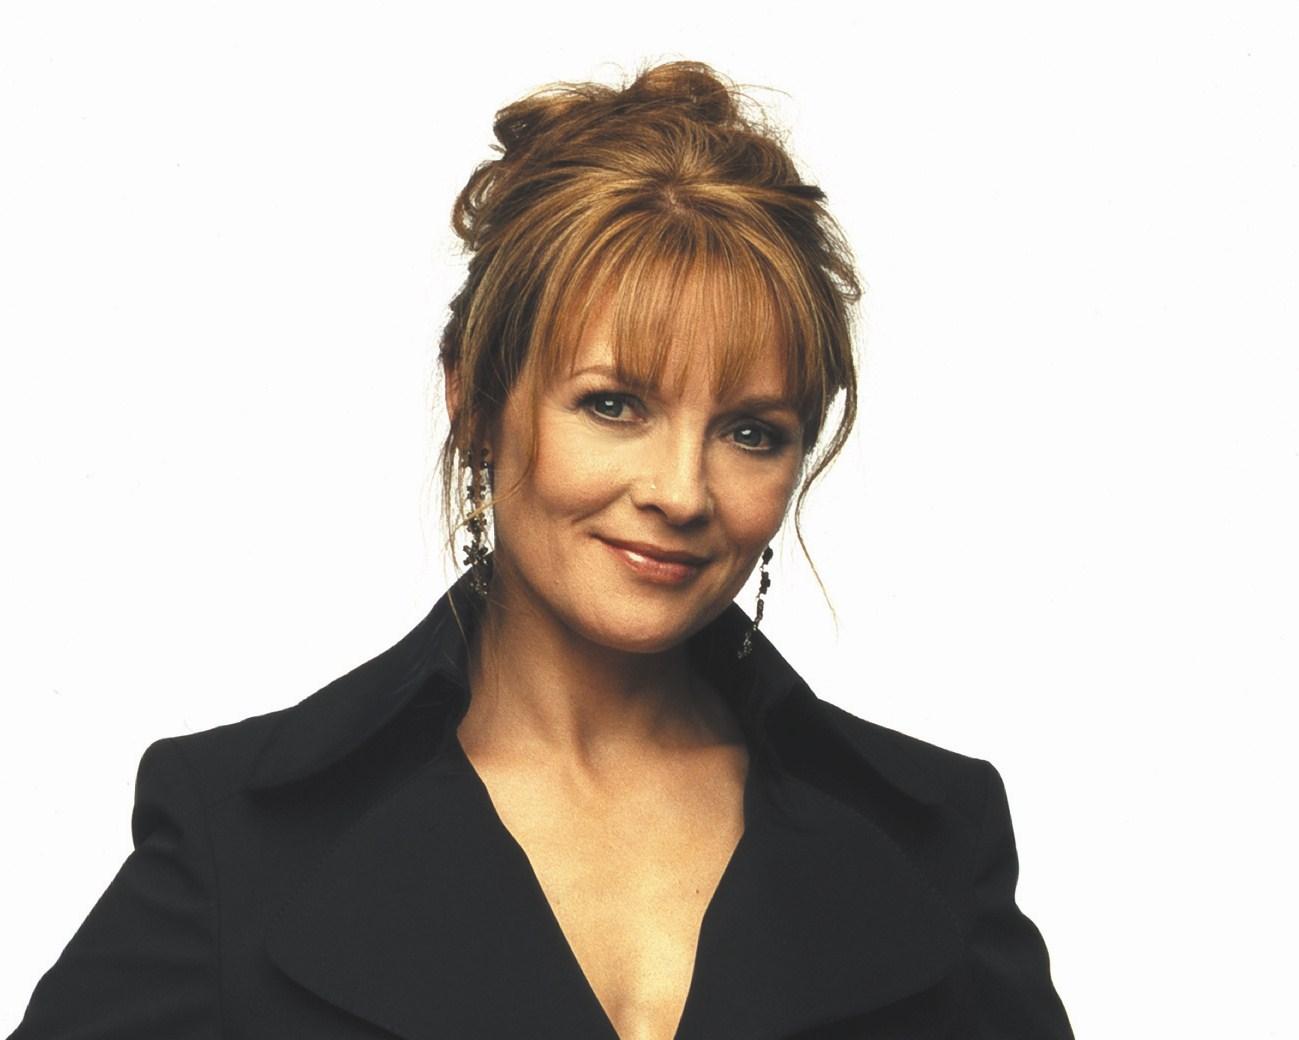 Mary Duff net worth